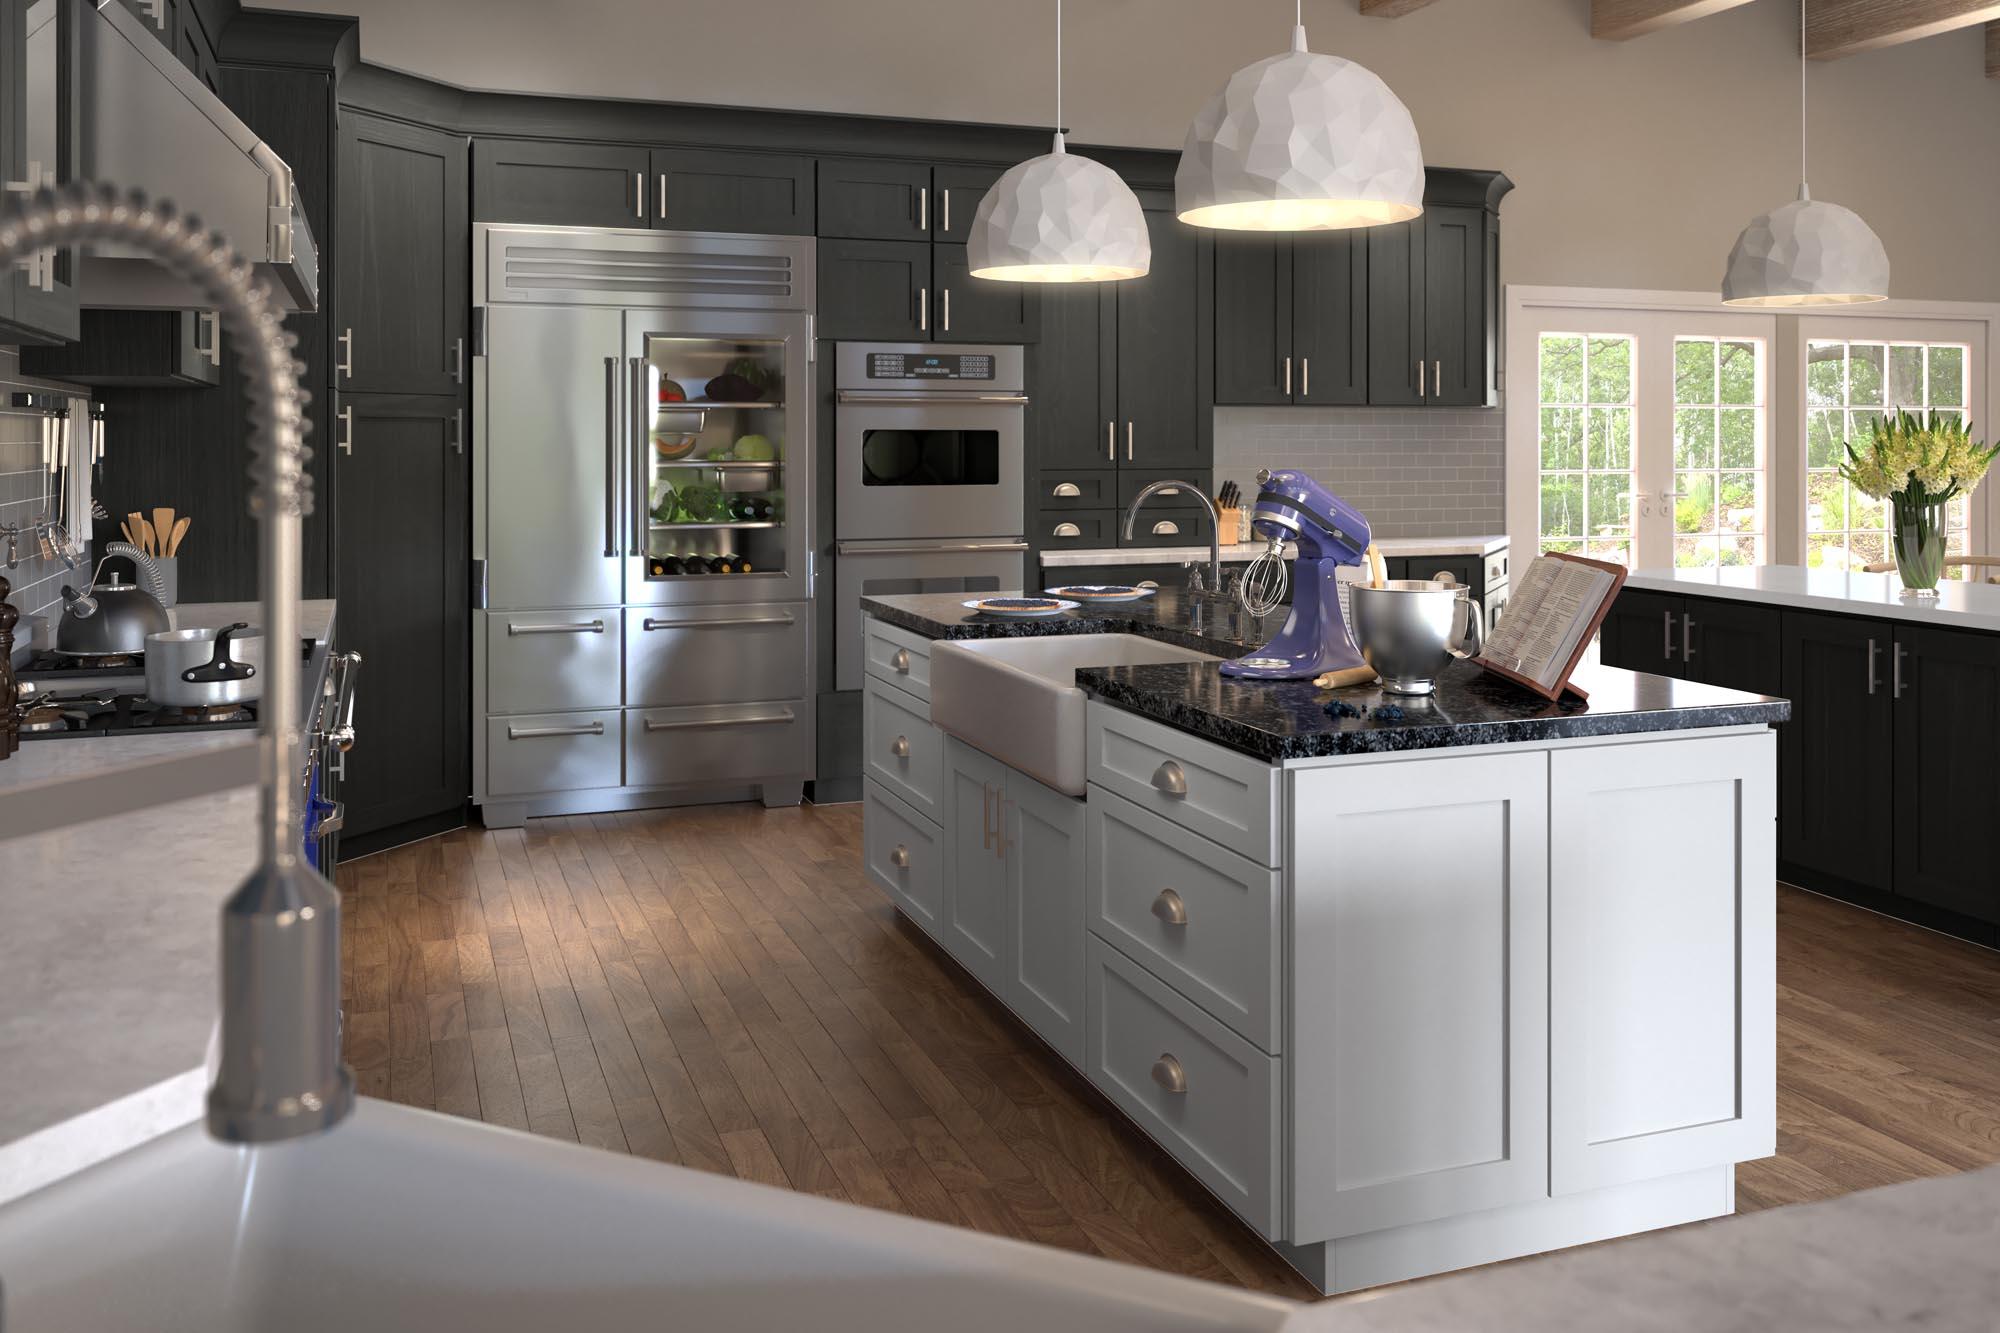 gray_kitchen_cabinets_cgi_rendering